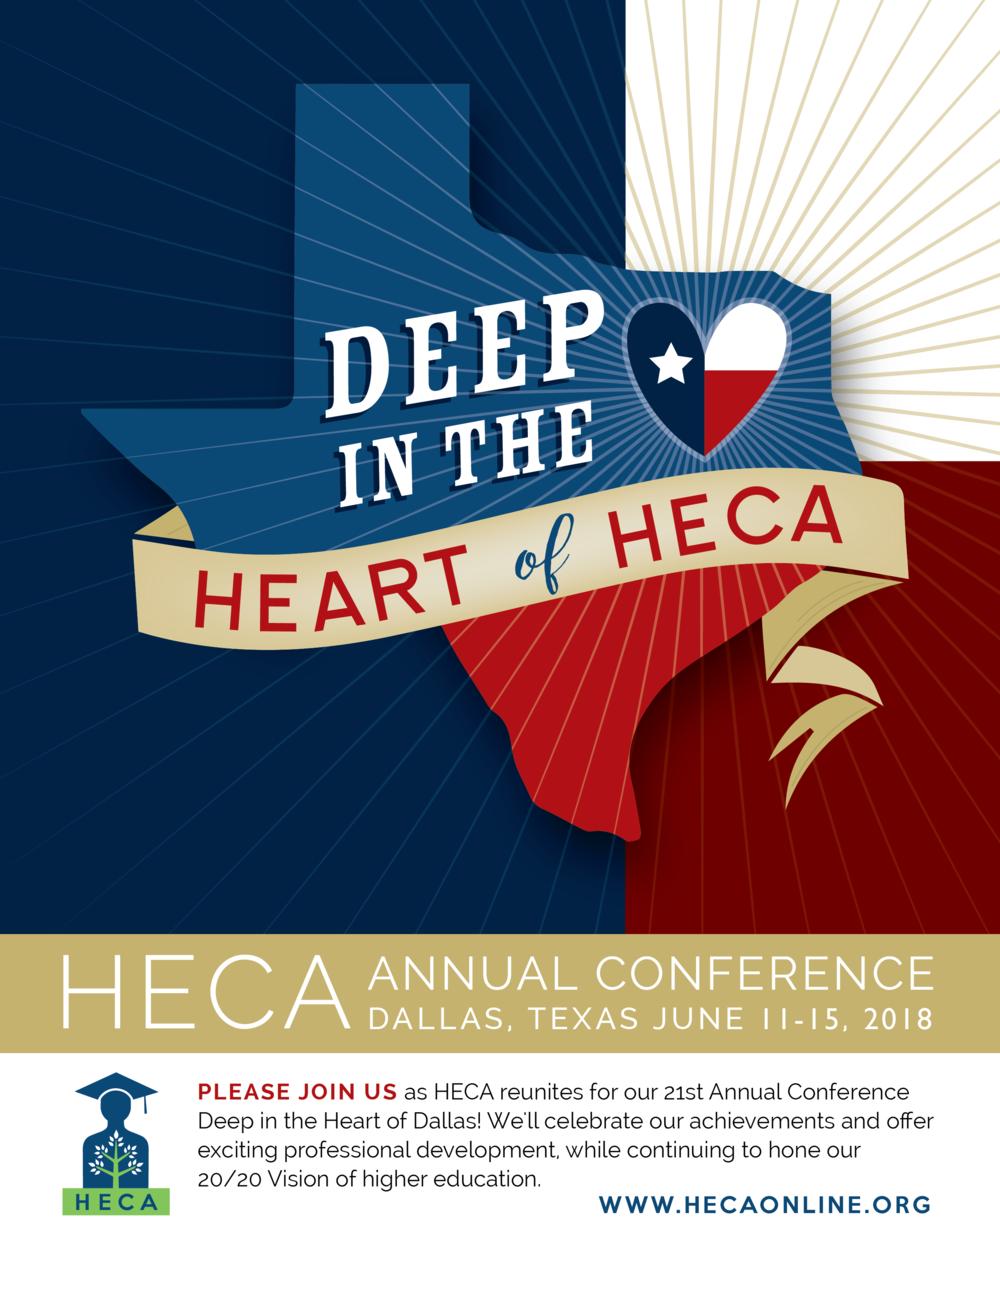 HECA_texas_print_ad-01.png